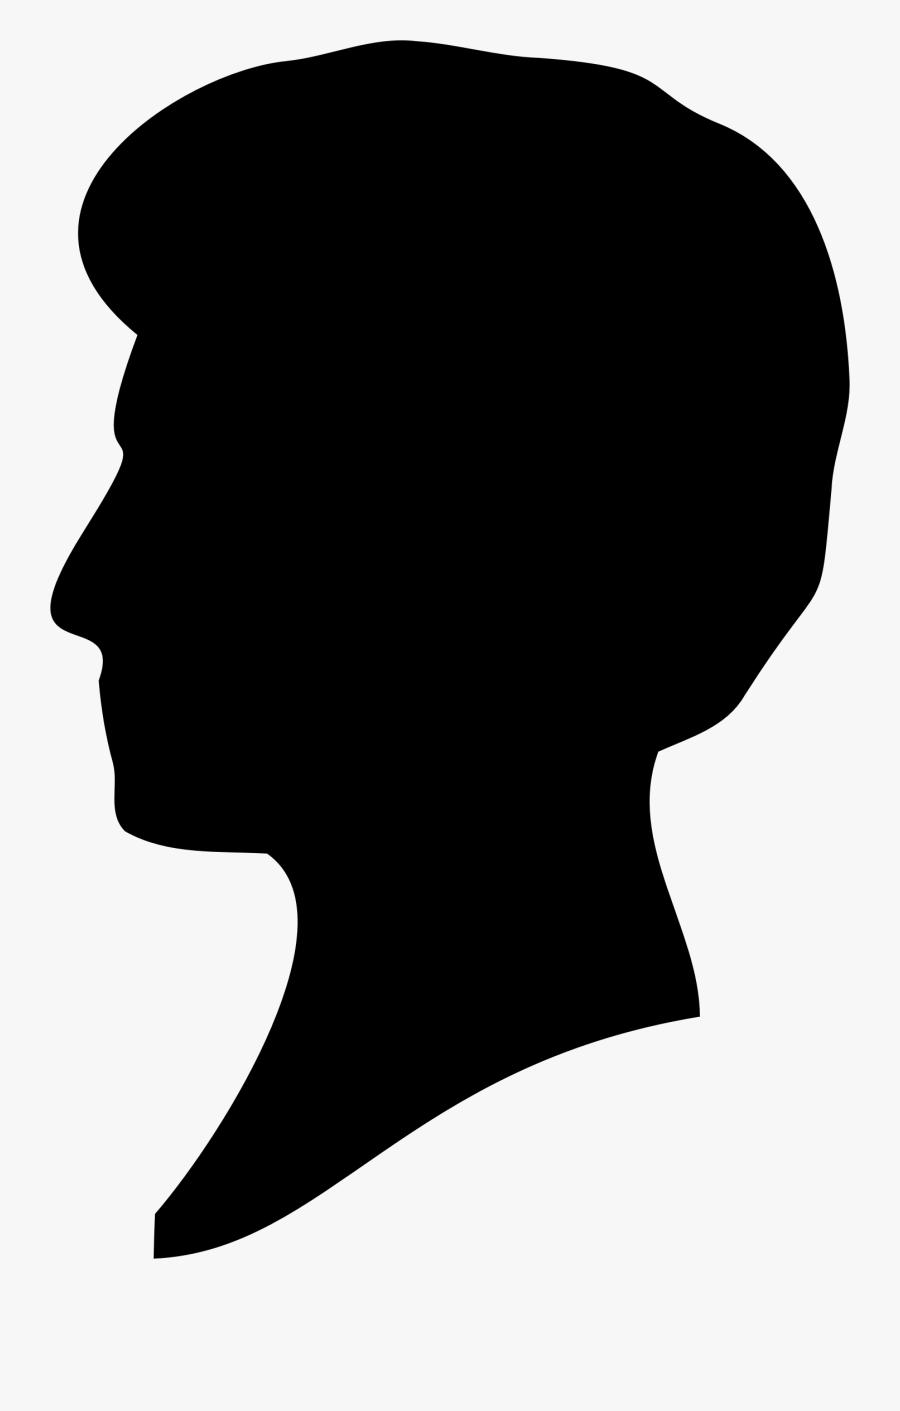 Deer Head Clipart Black And White - Barbie Ken Head Silhouette, Transparent Clipart